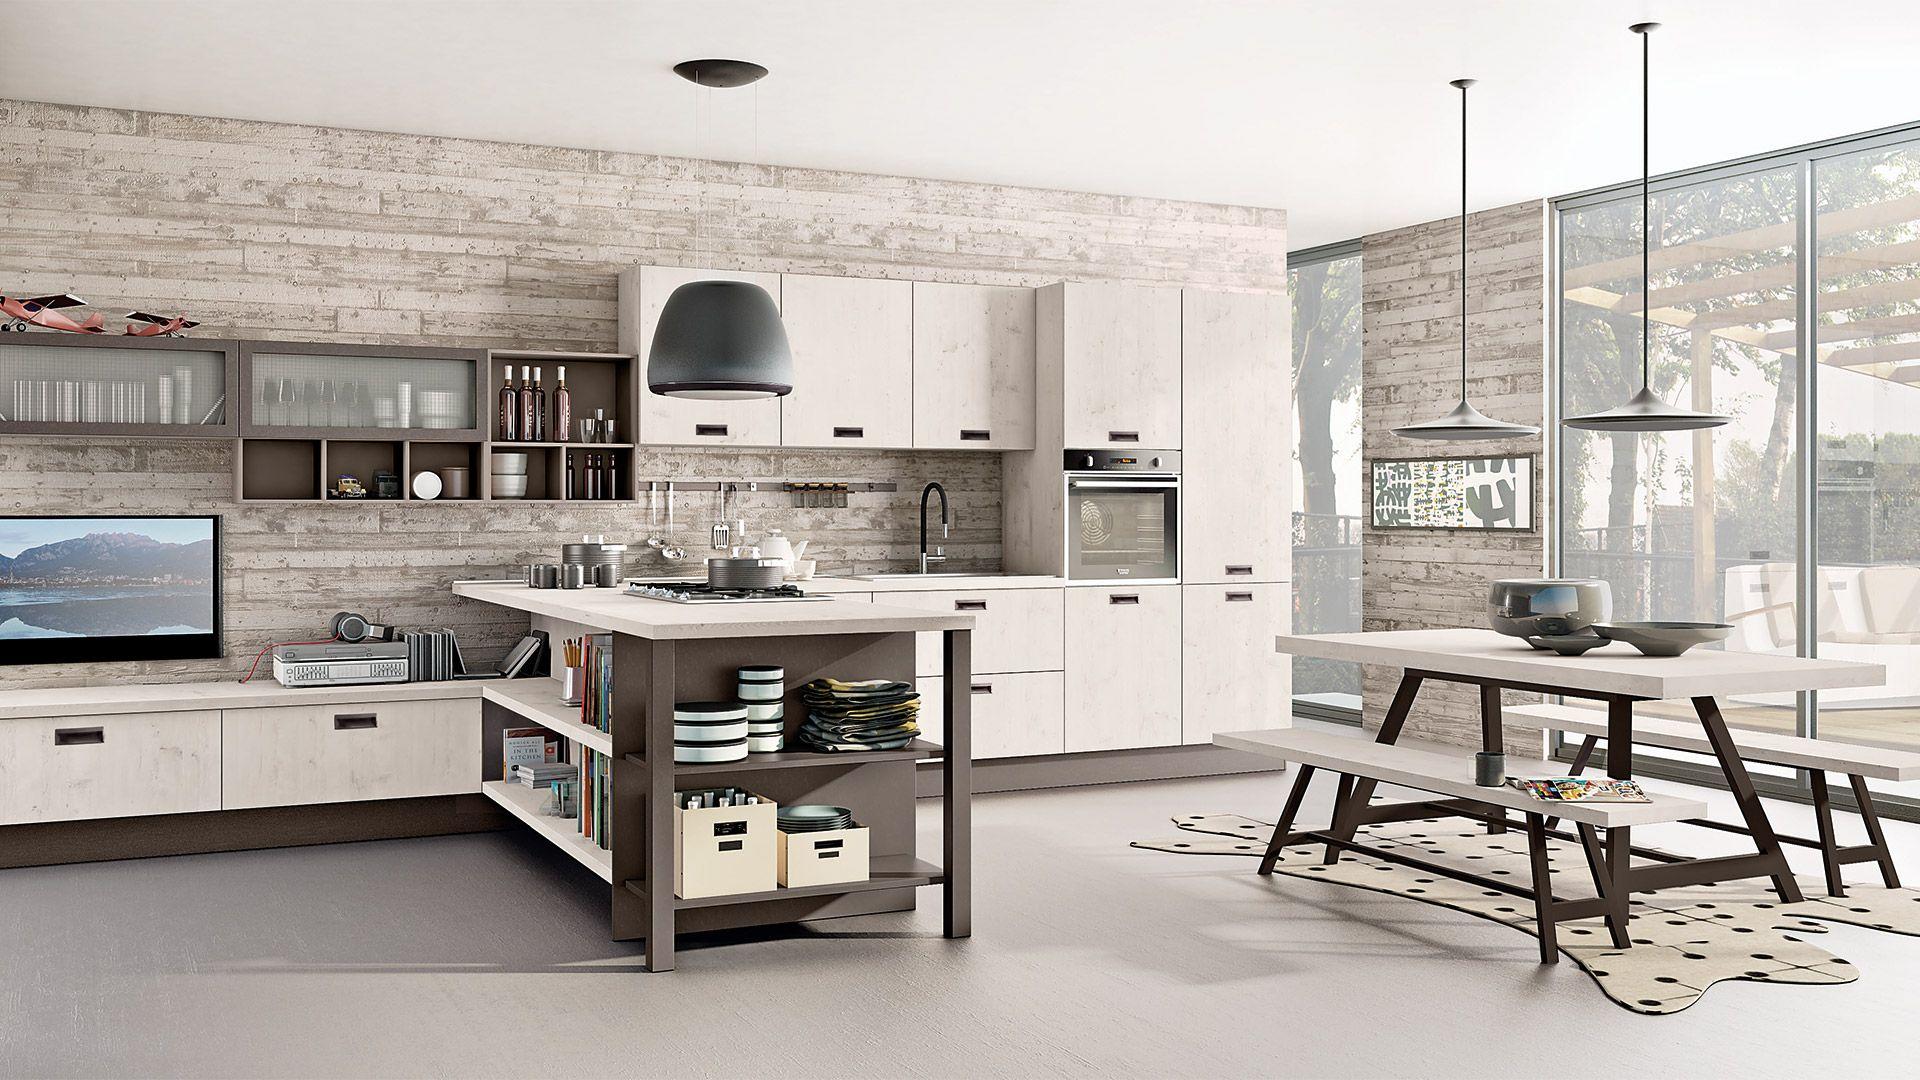 Cucina Kyra - Cucine Moderne - Creo Kitchens in 2019 ...